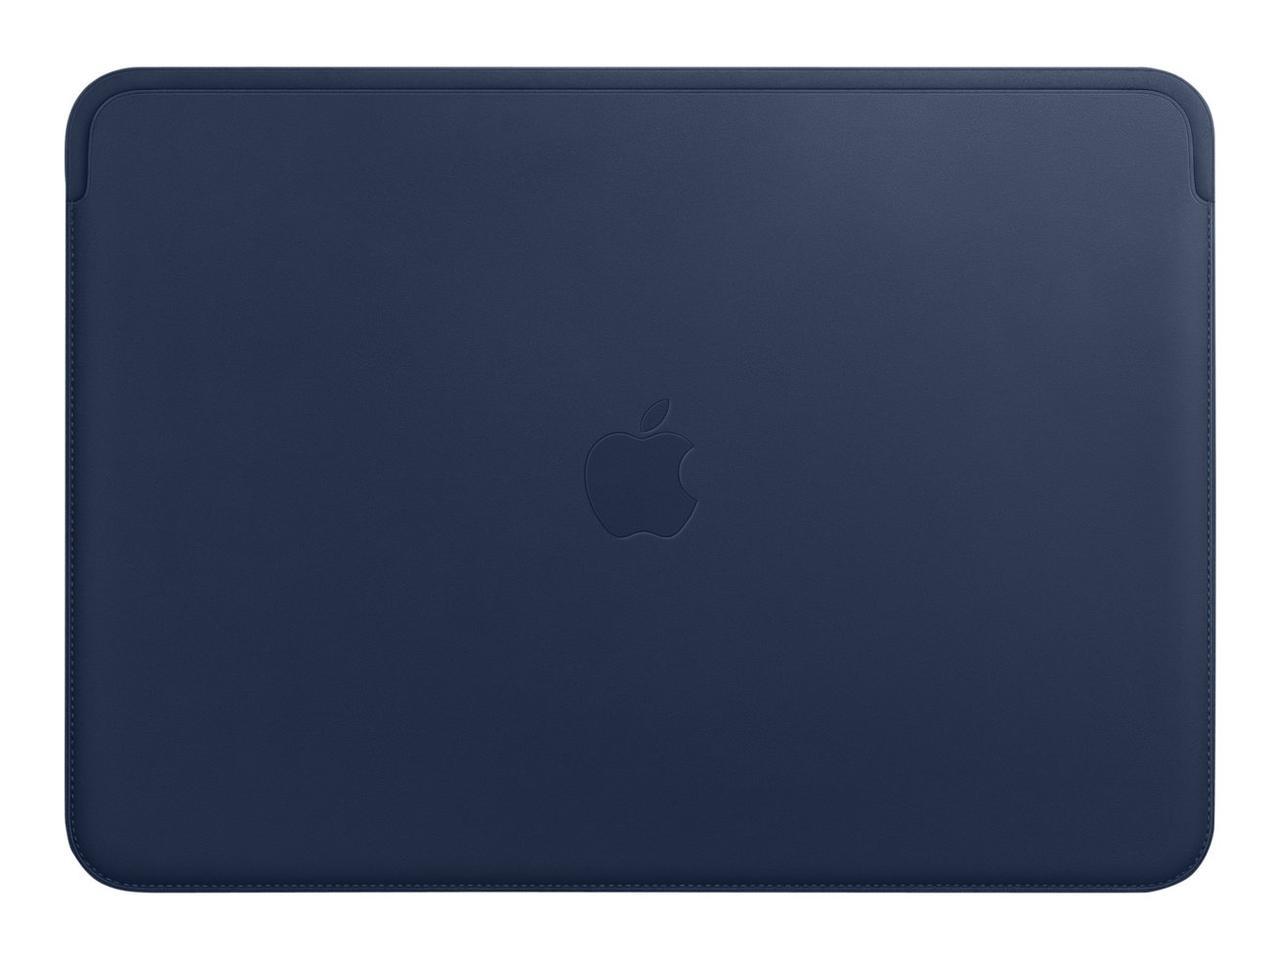 "Чехол для MacBook 13"" Apple Leather Sleeve, тёмно-синий (MRQL2ZM/A)"